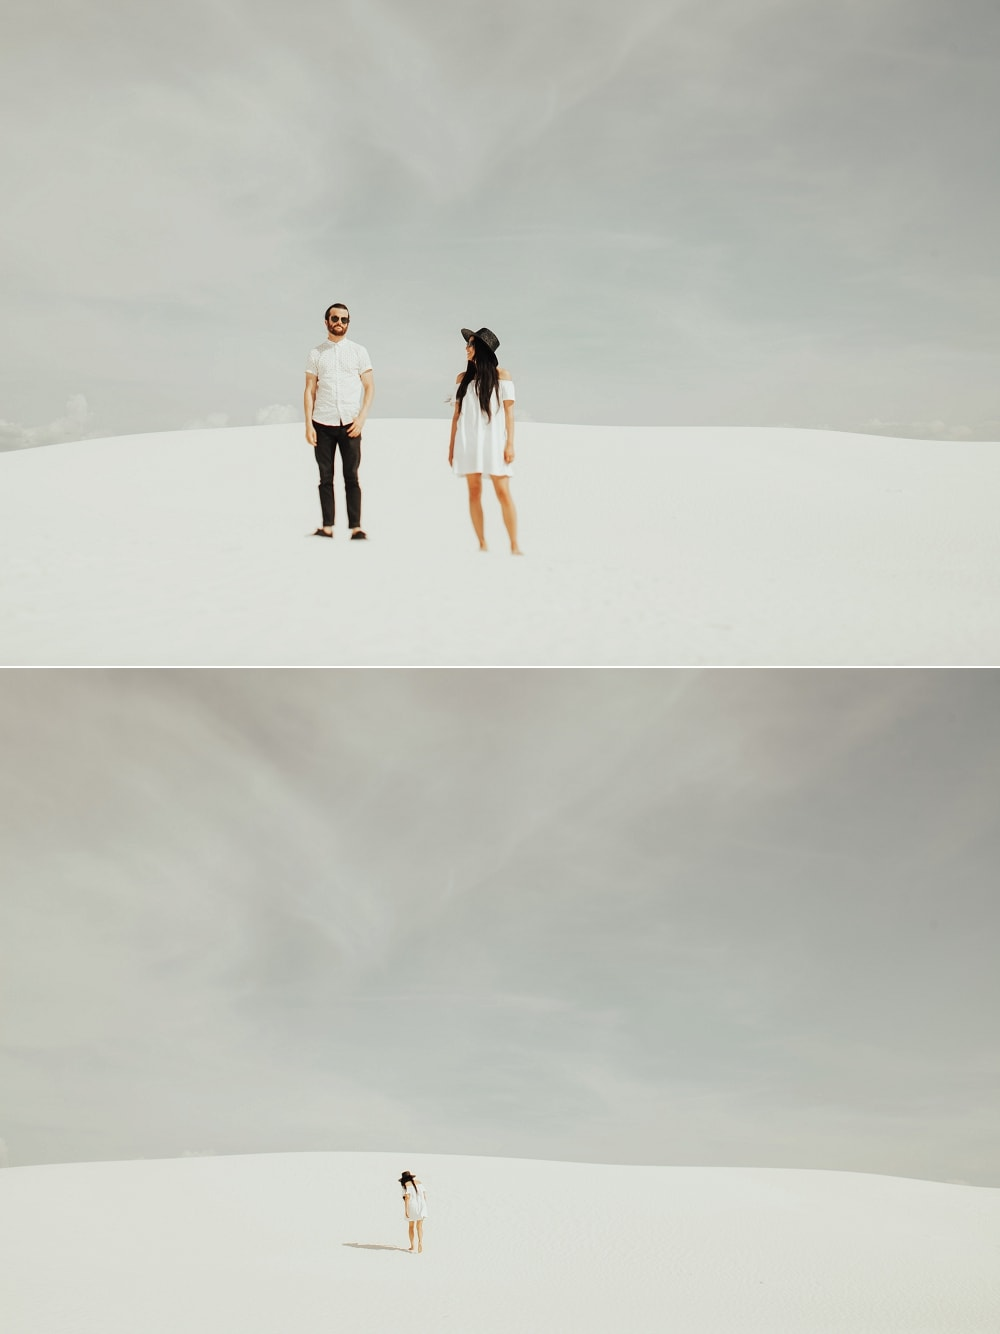 white sands national park couple